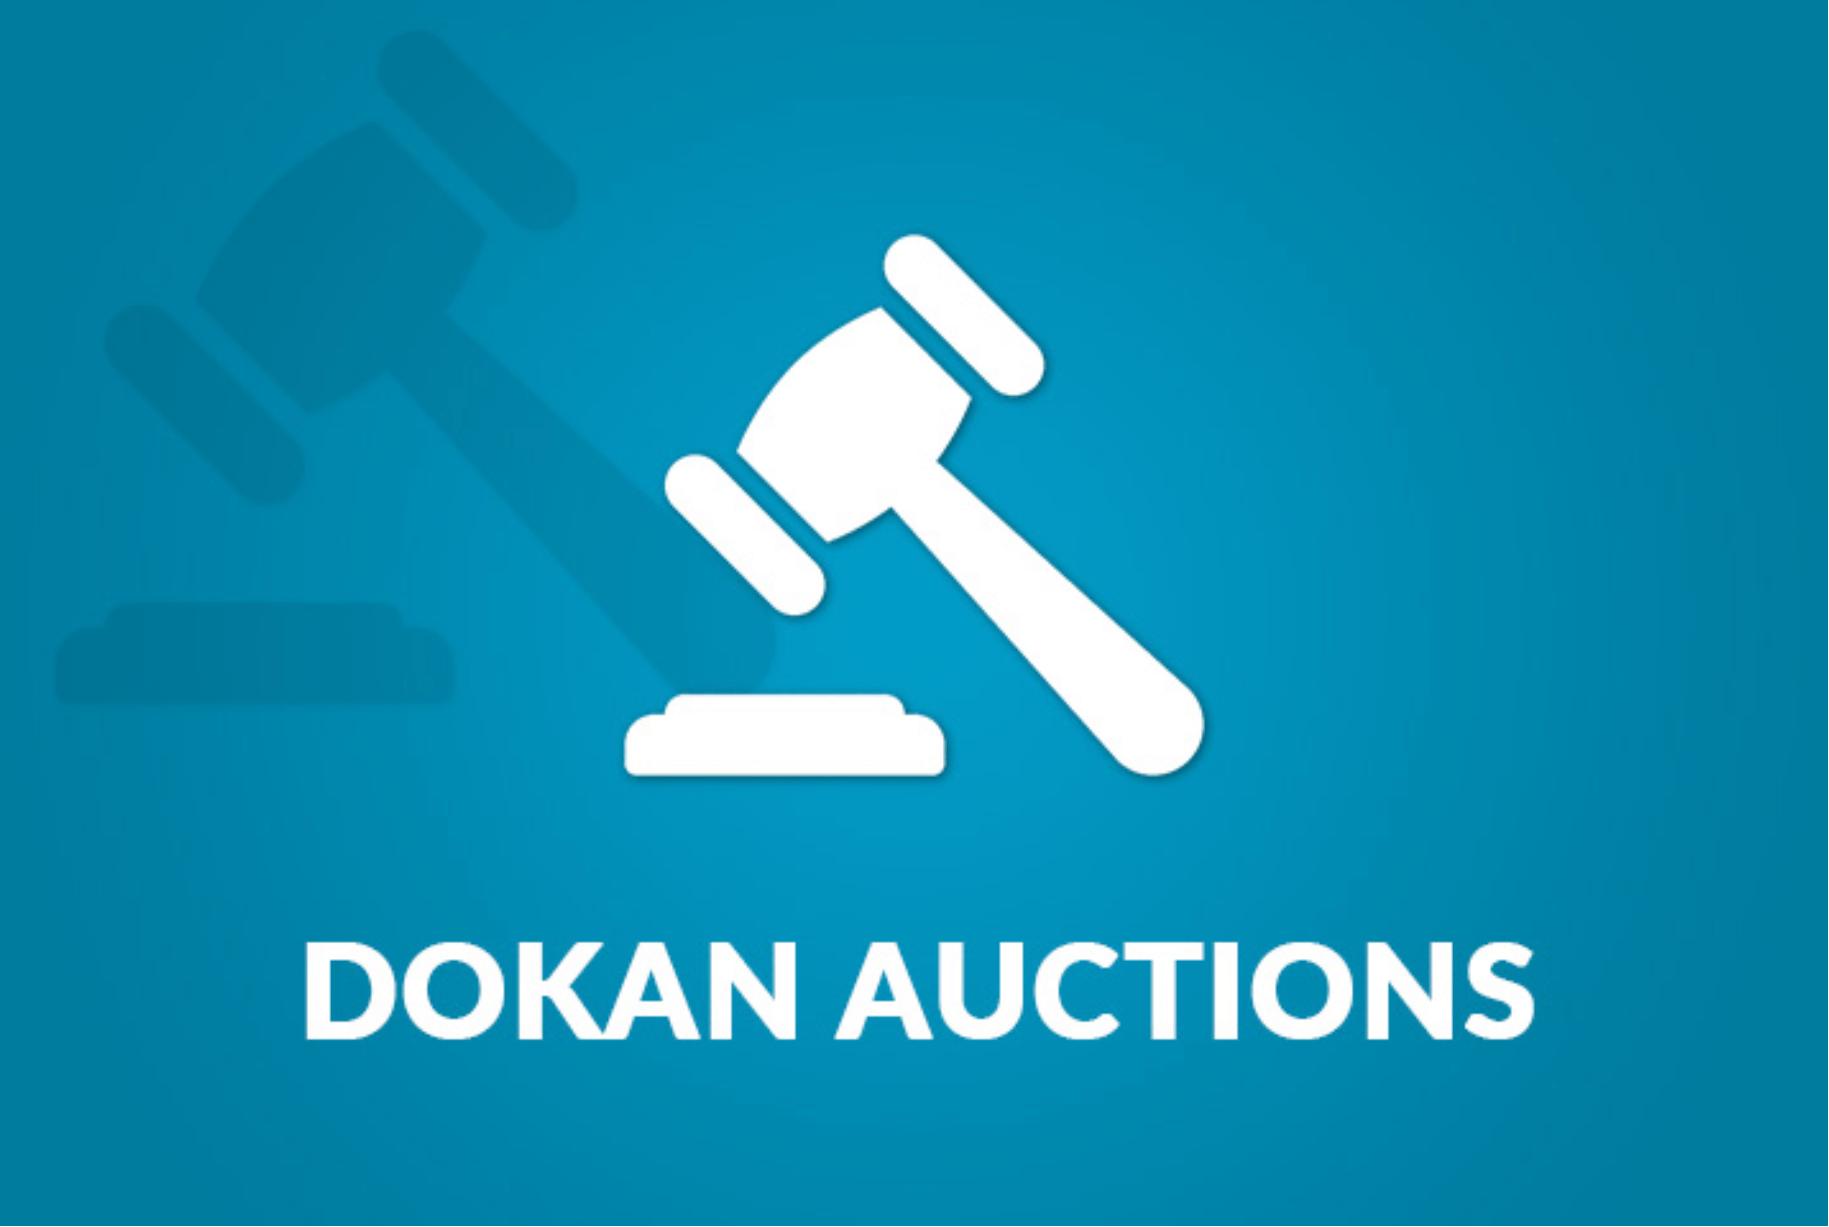 Dokan Simple Auctions插件横幅。